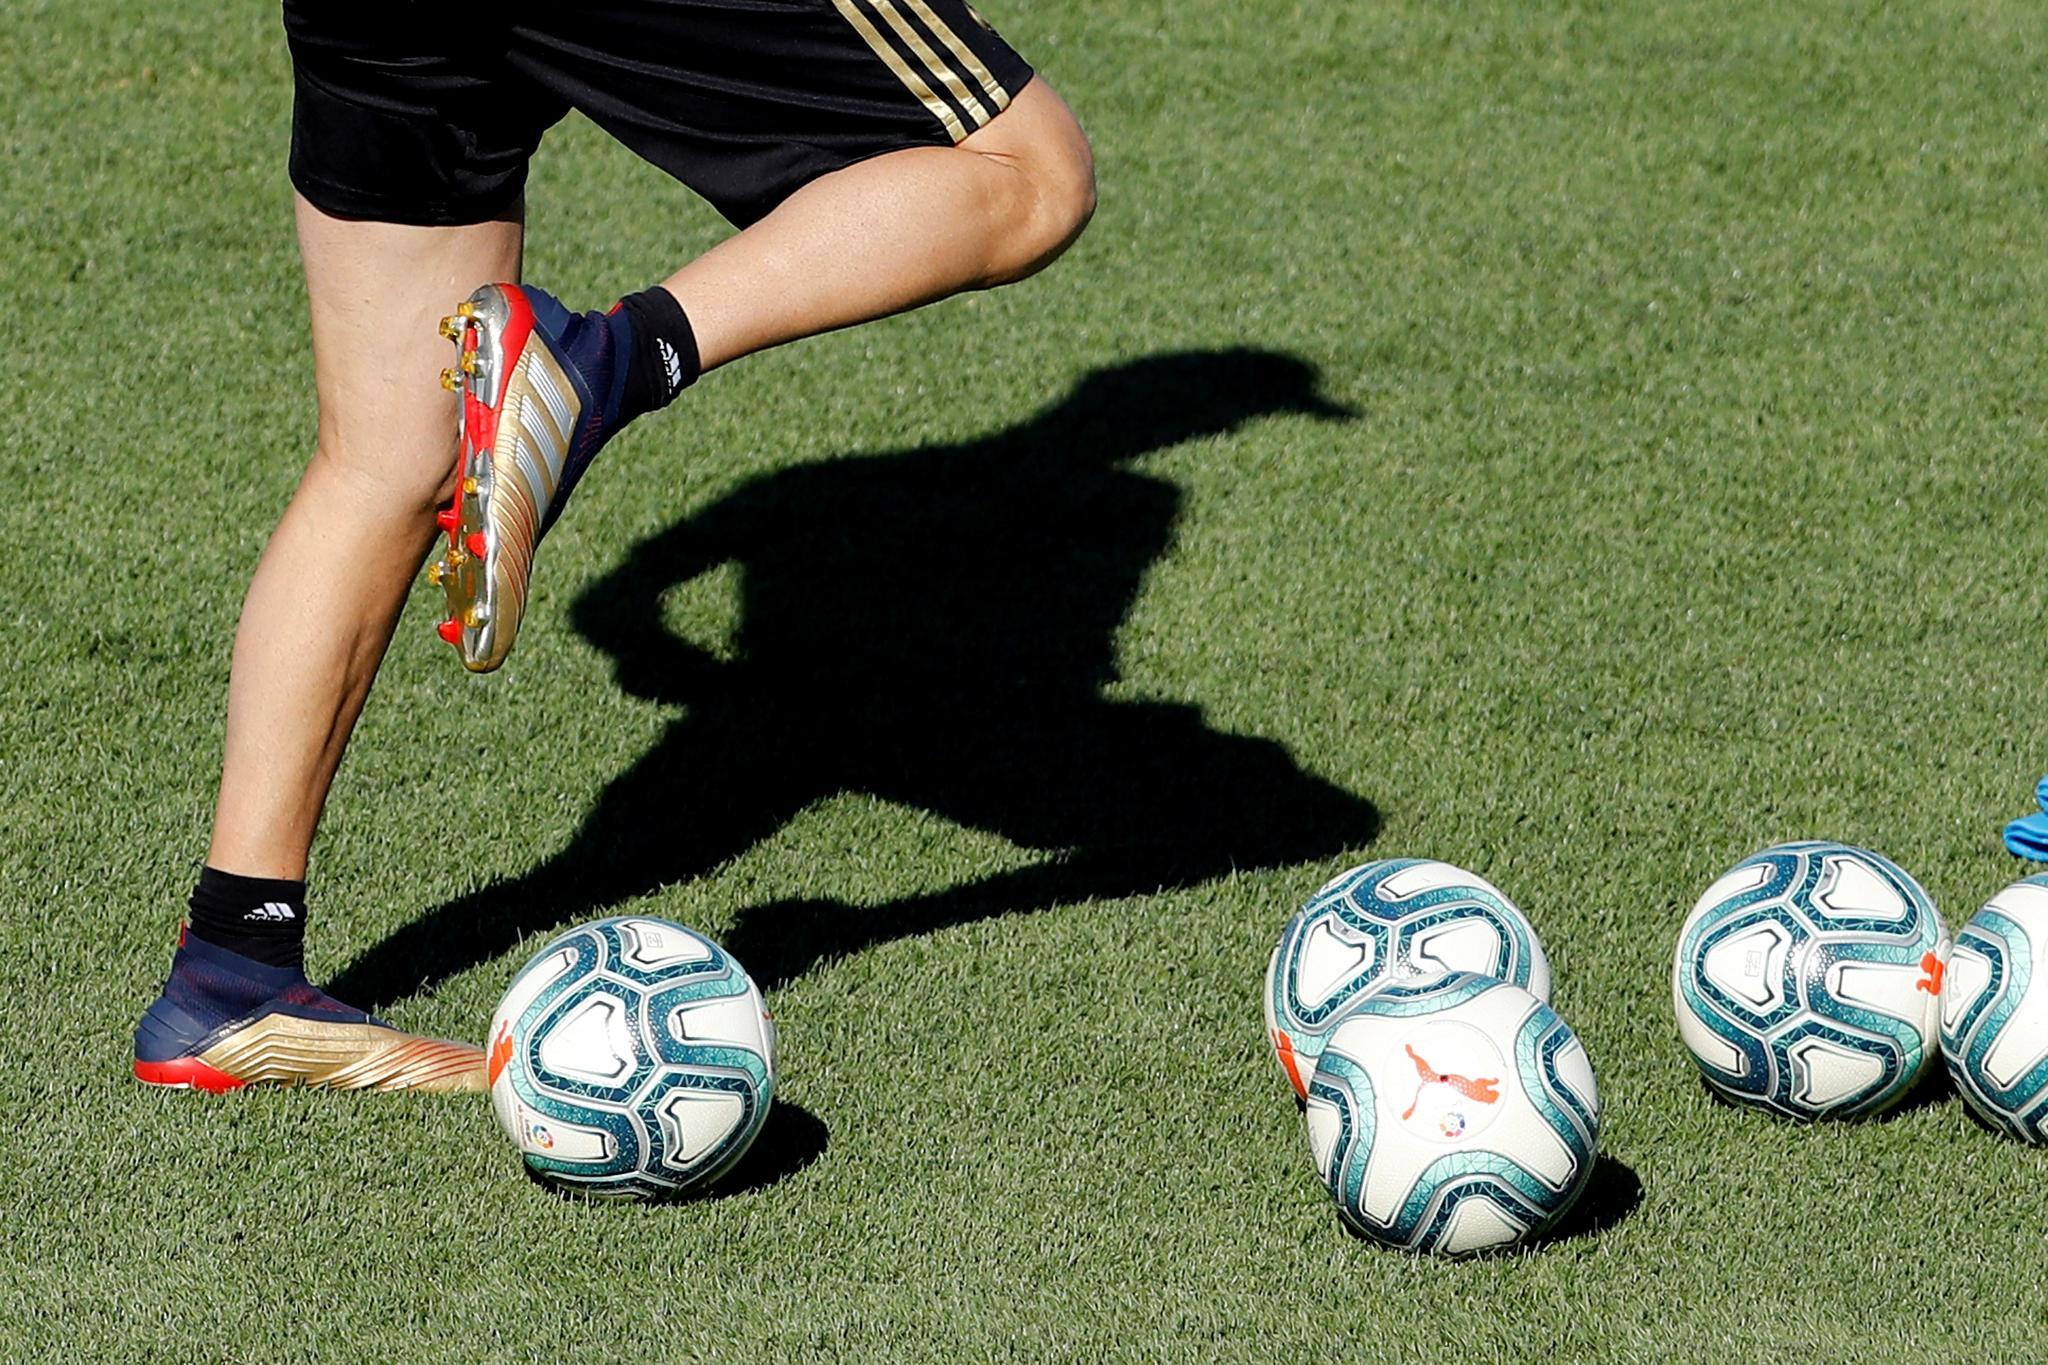 -FOTODELDIA- GRAF6764. MADRID.- El técnico del Real Madrid, Zinedine...